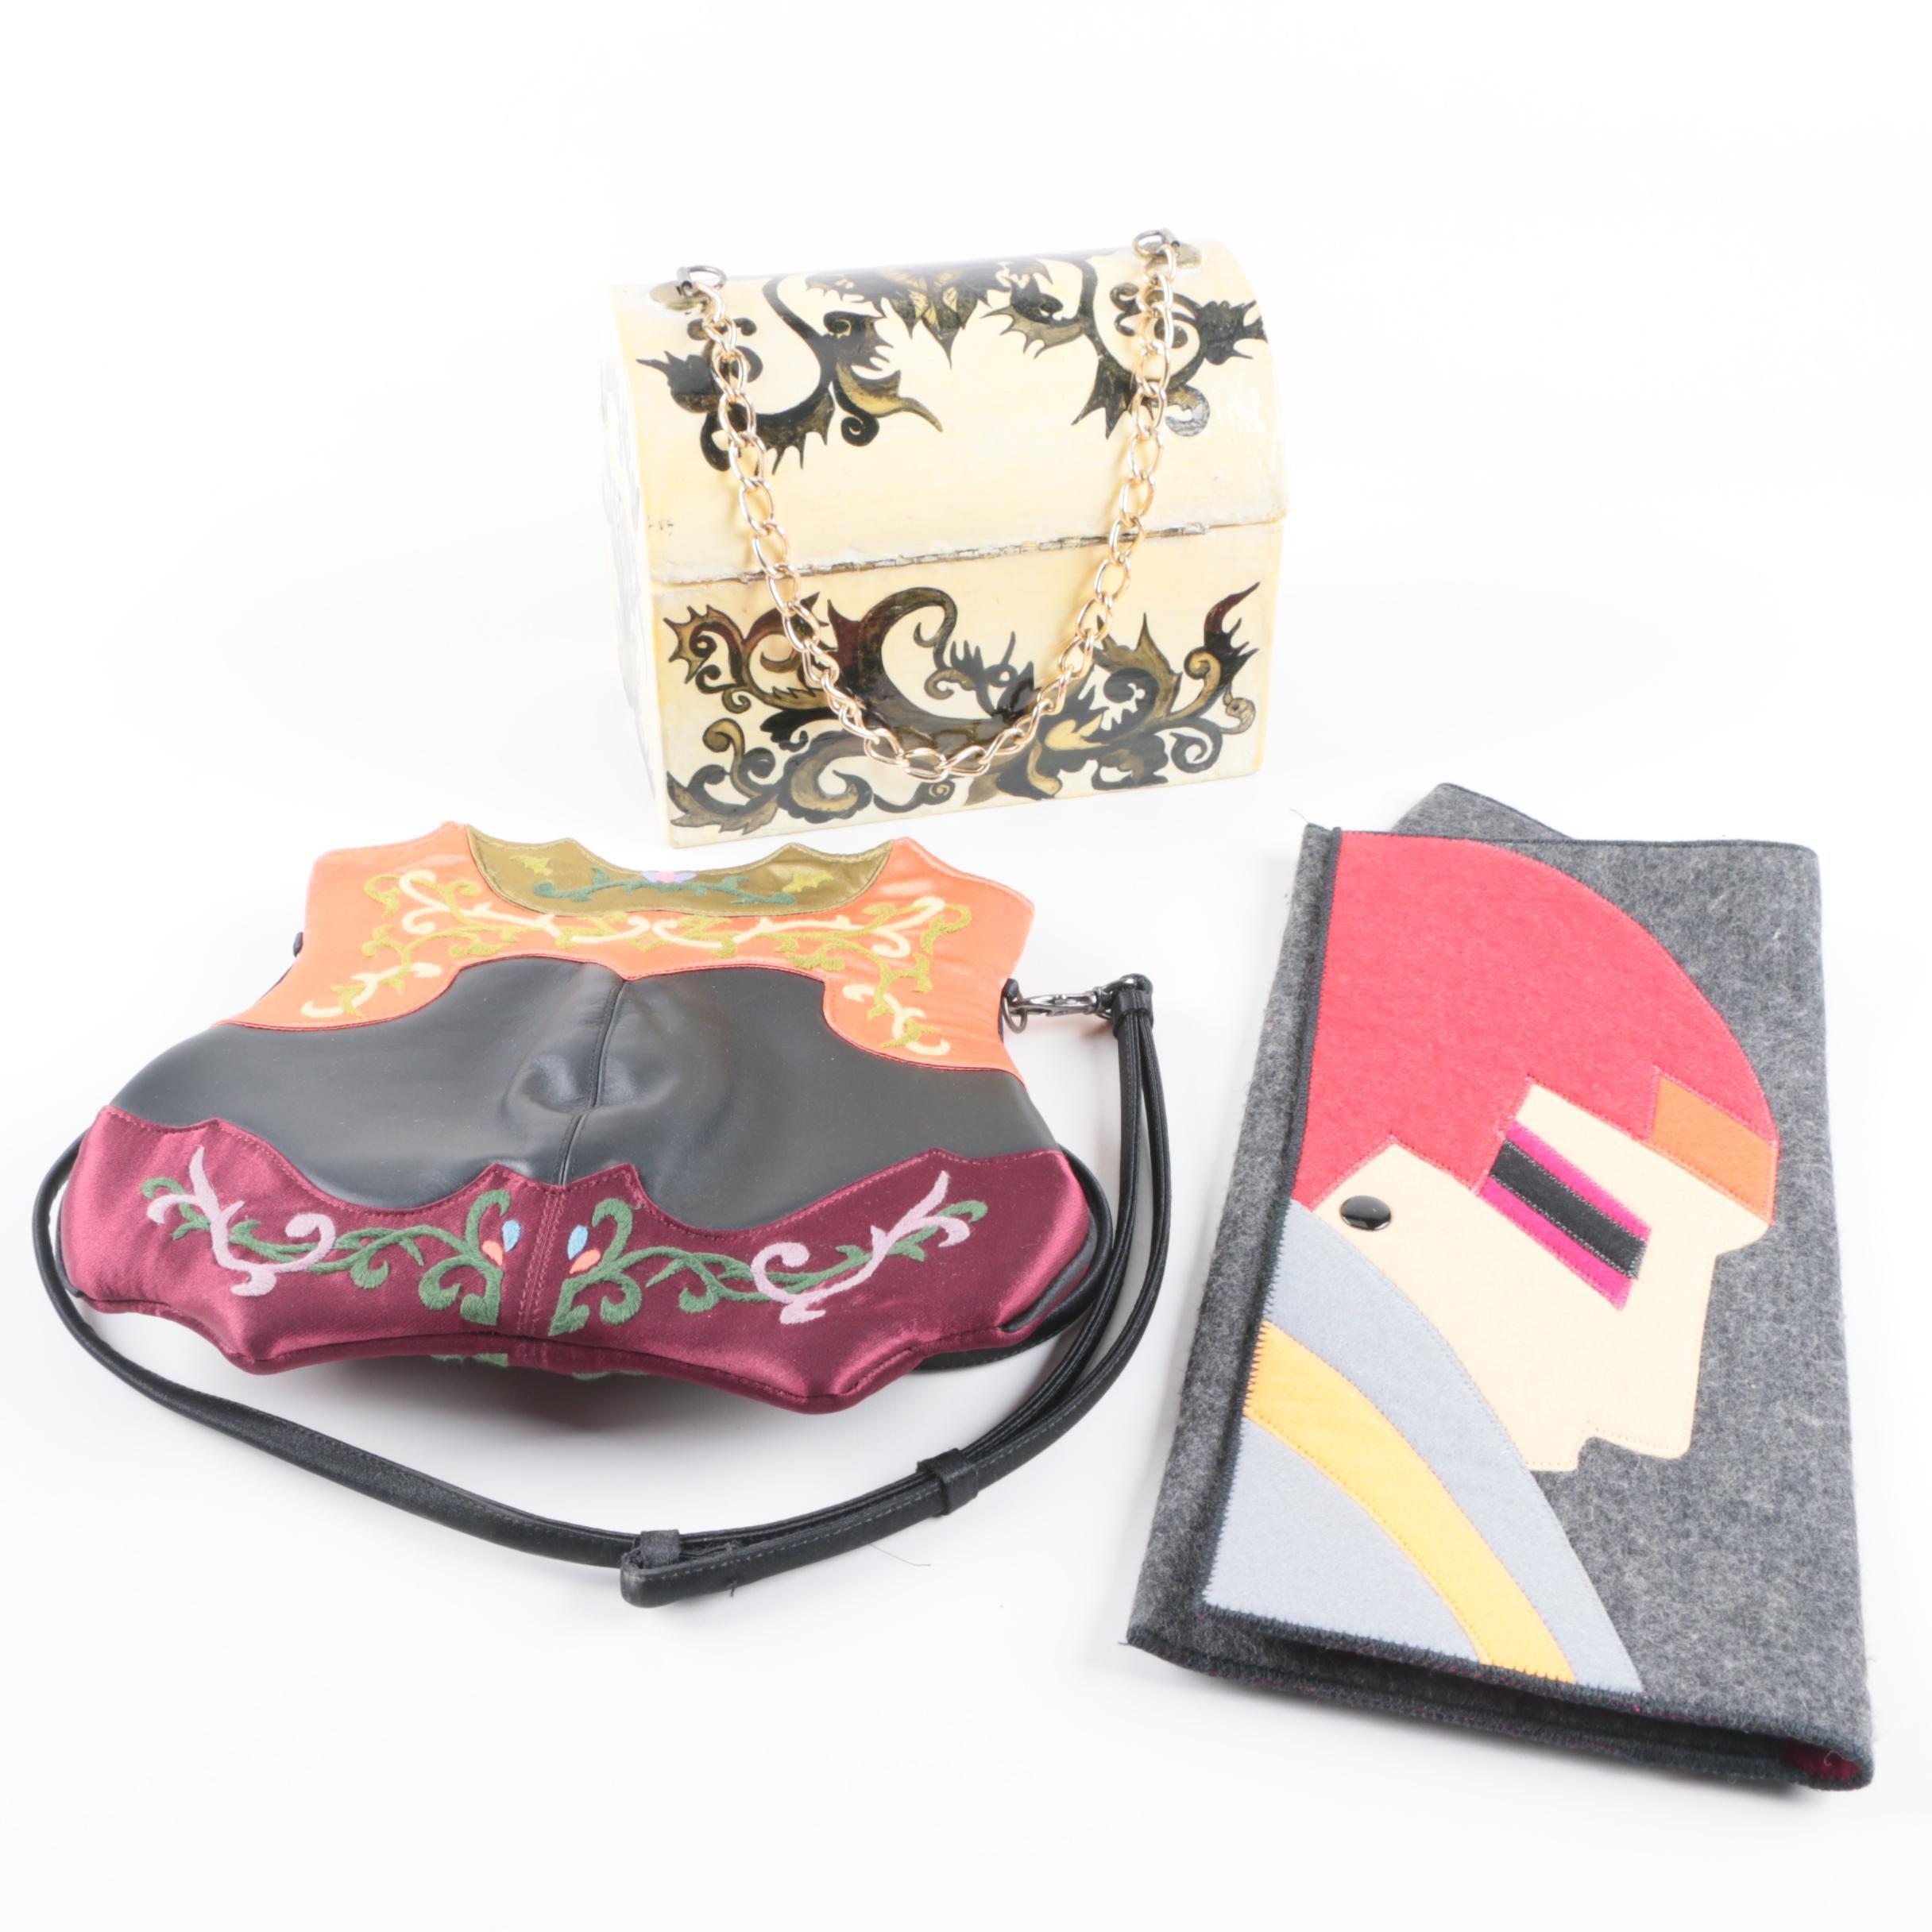 Handmade Handbags and Clutch